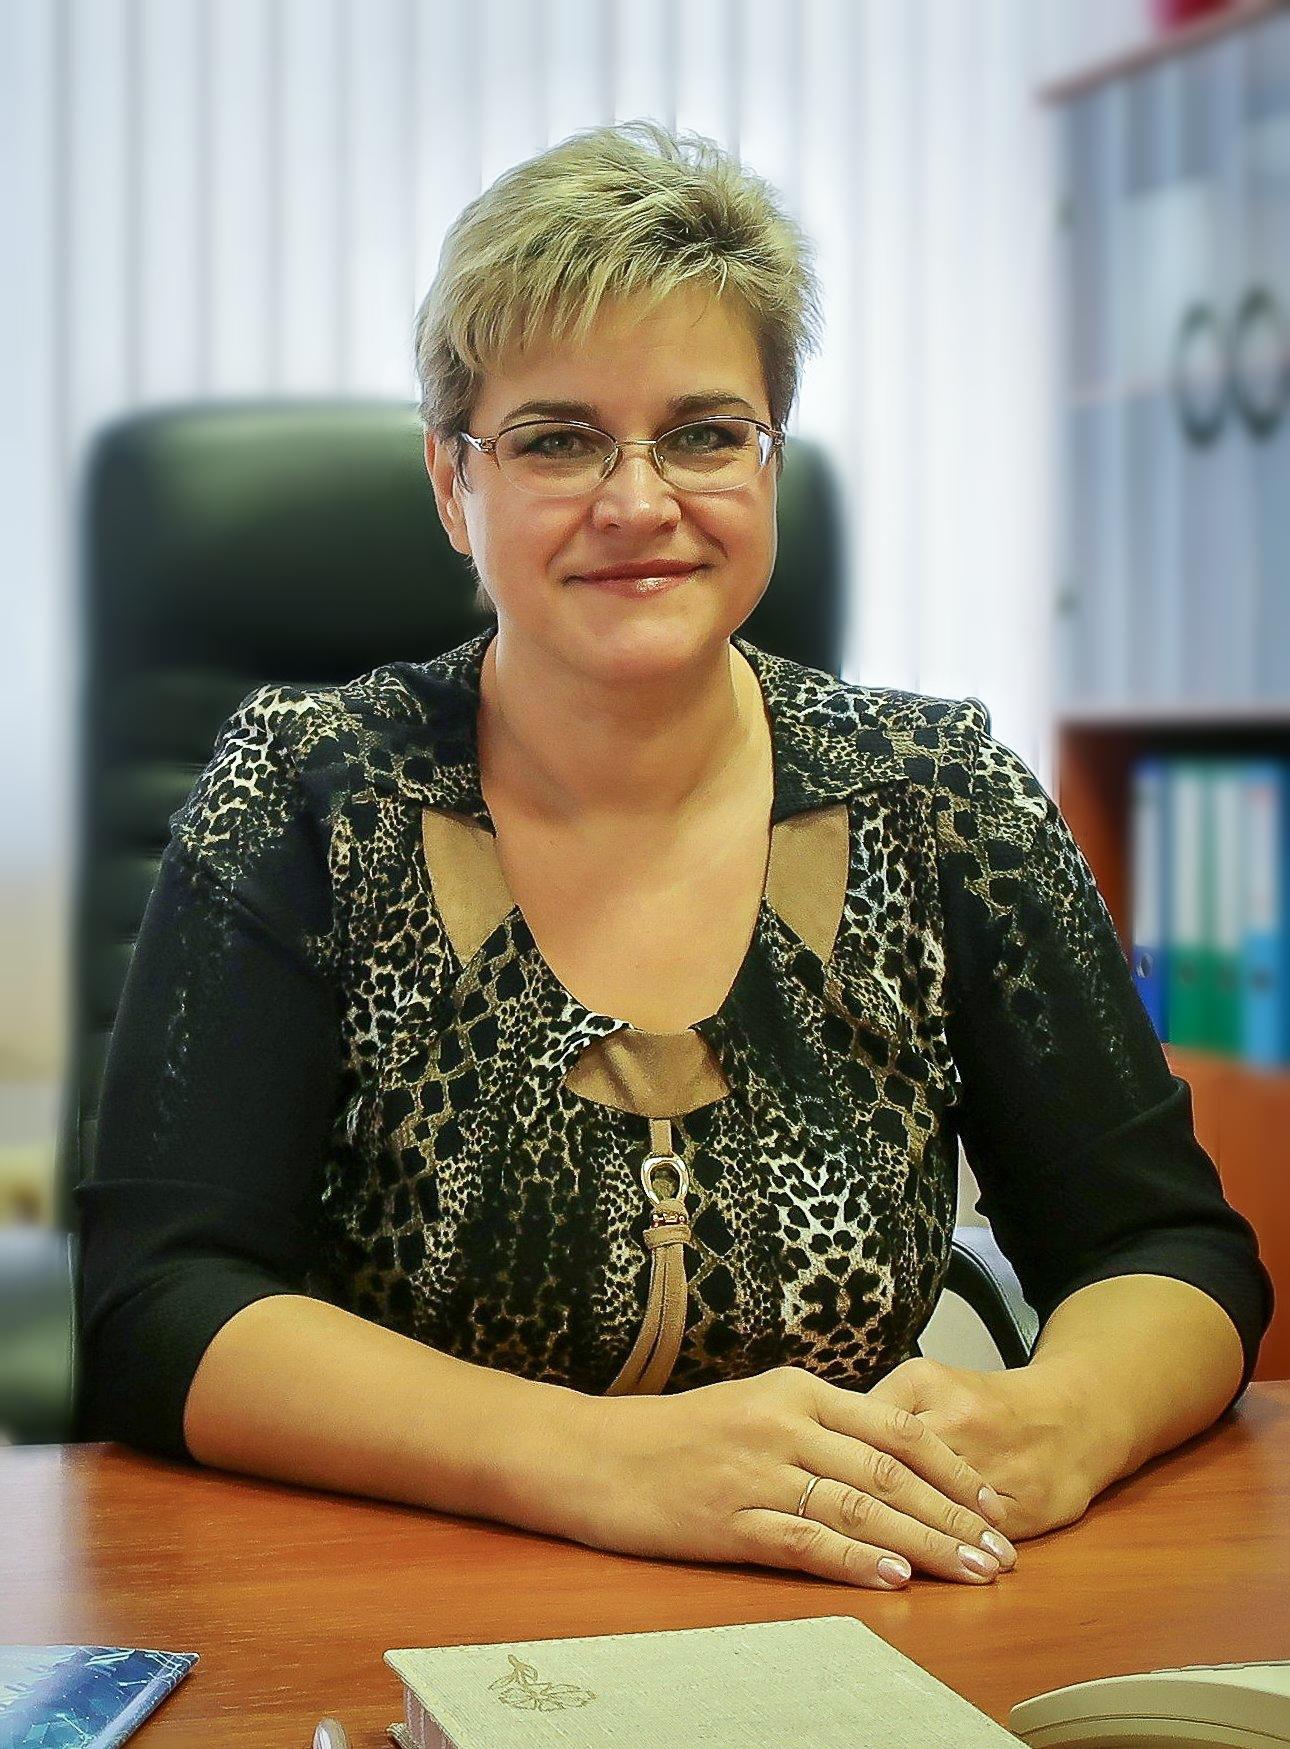 Тригубович Лариса Геннадьевна